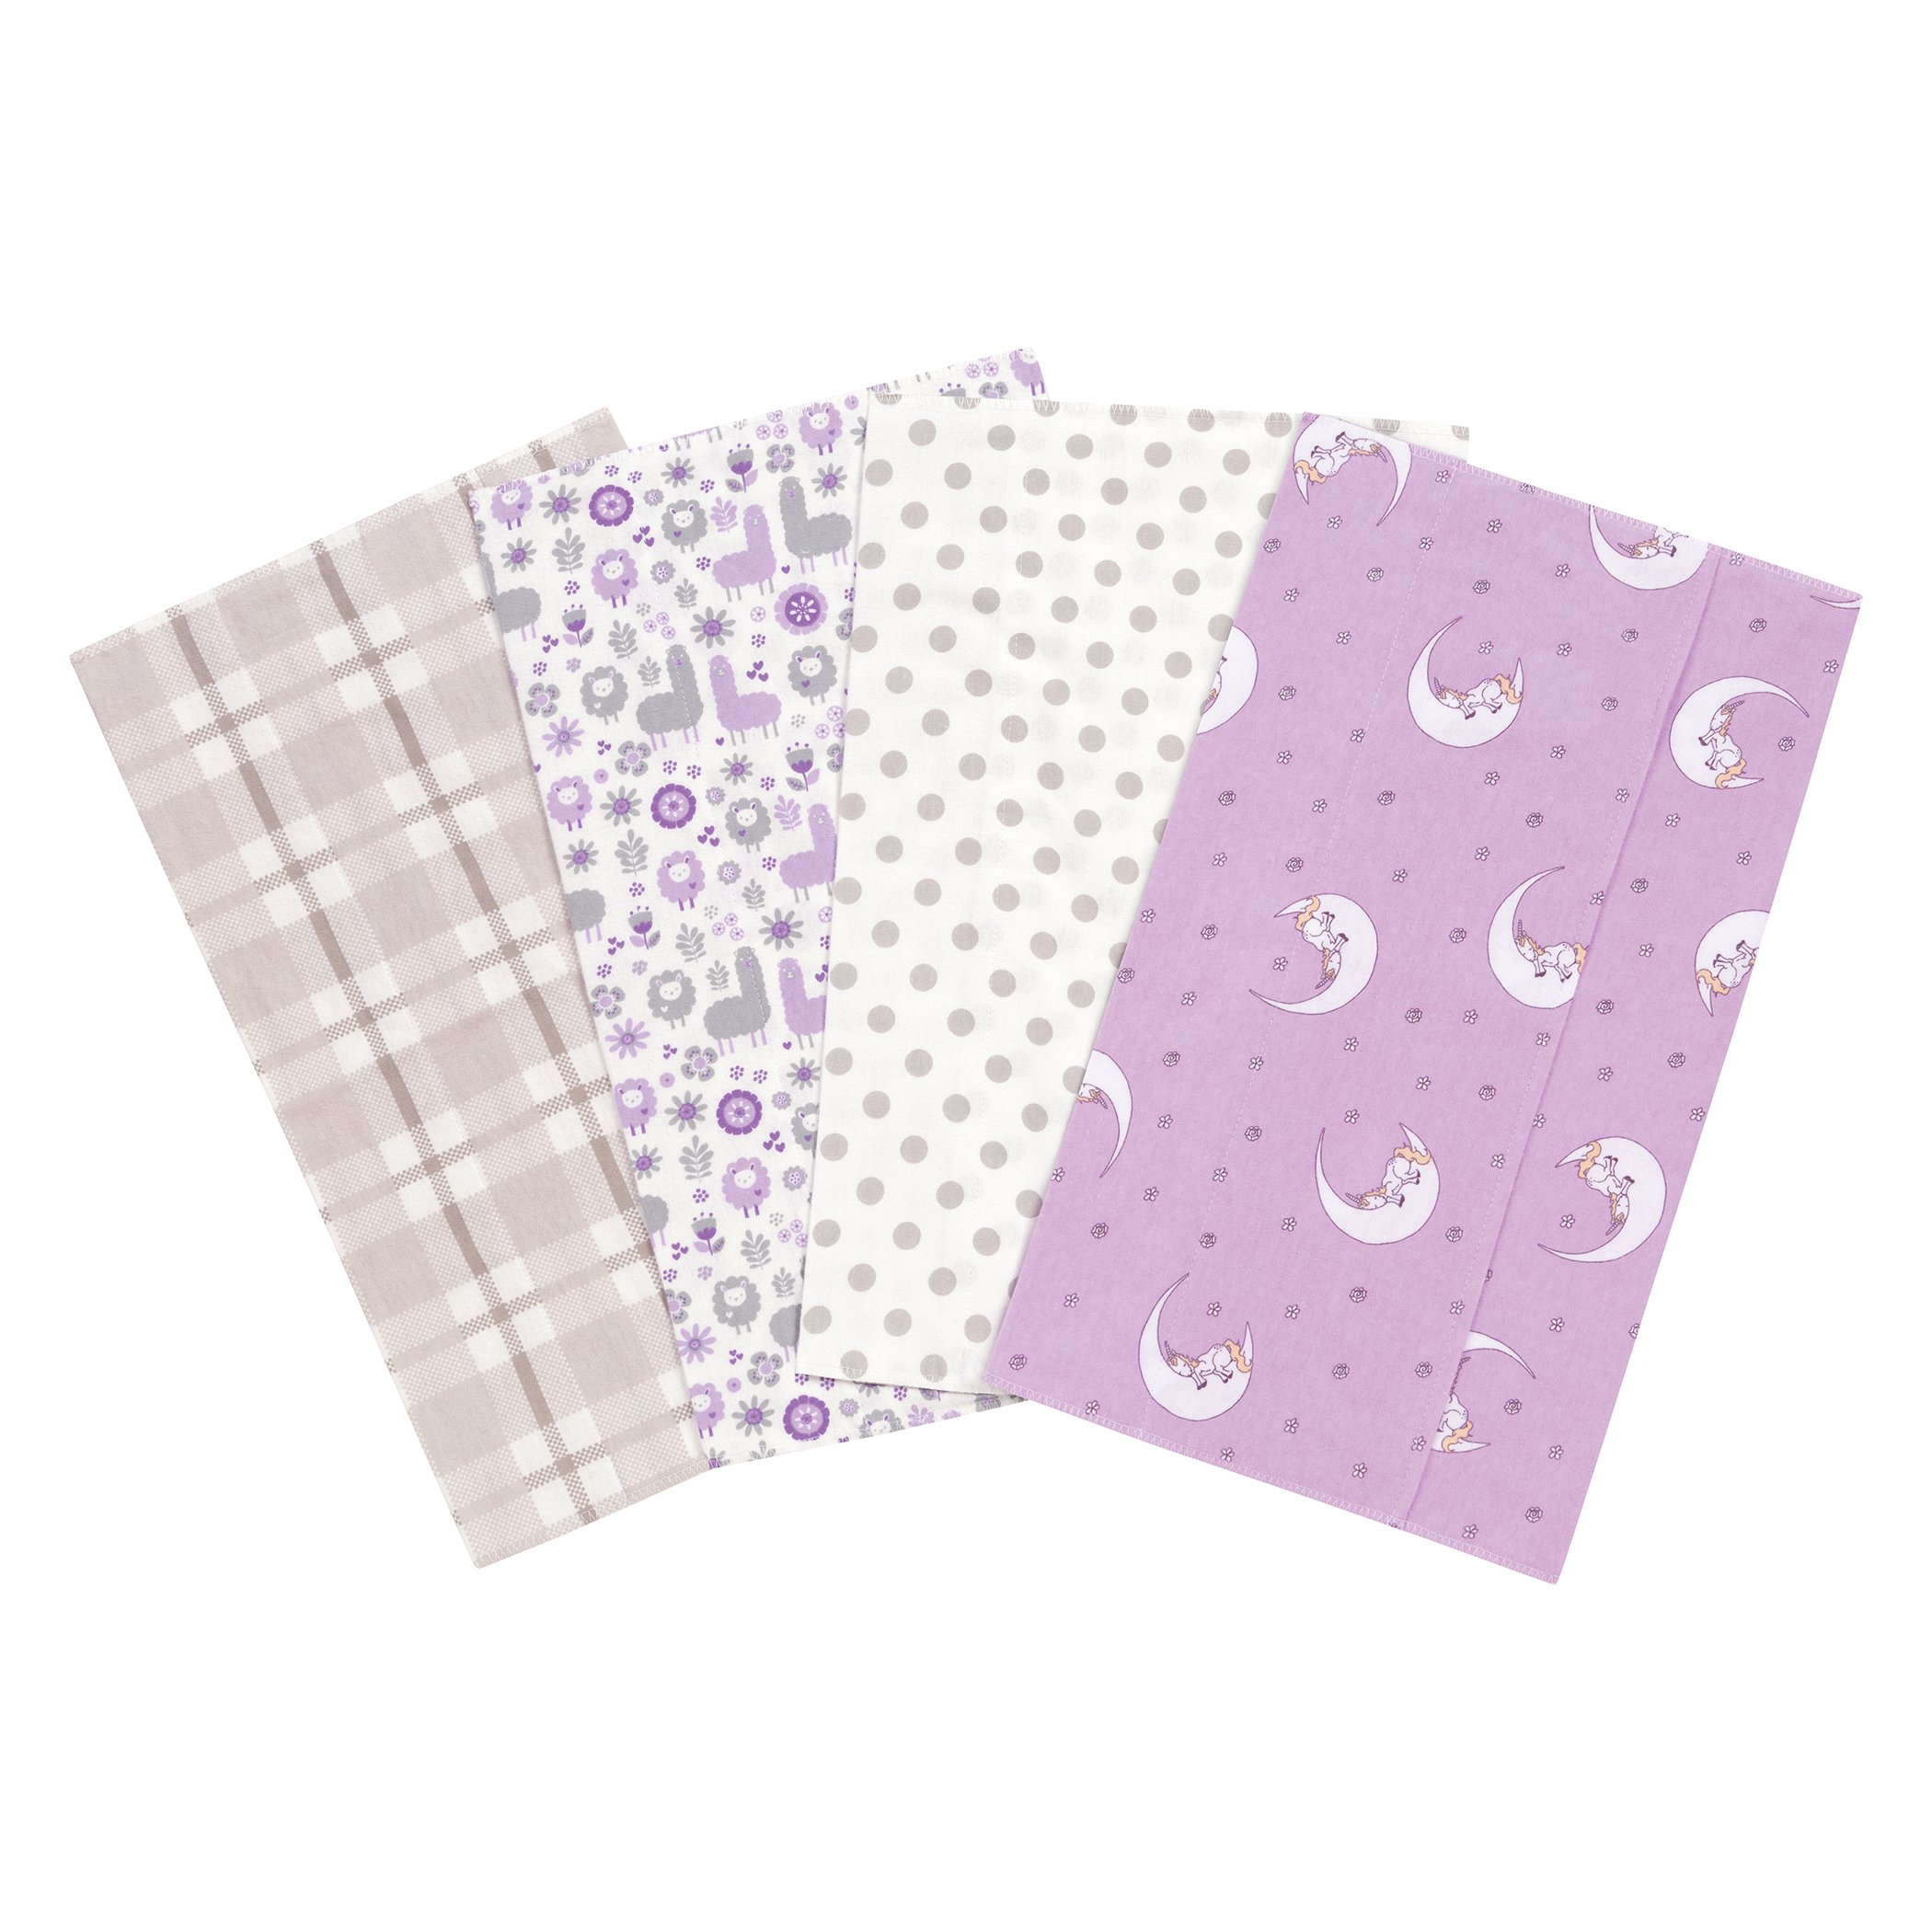 Trend Lab Llamas and Unicorns Flannel Burp Cloth Set, 4 Piece